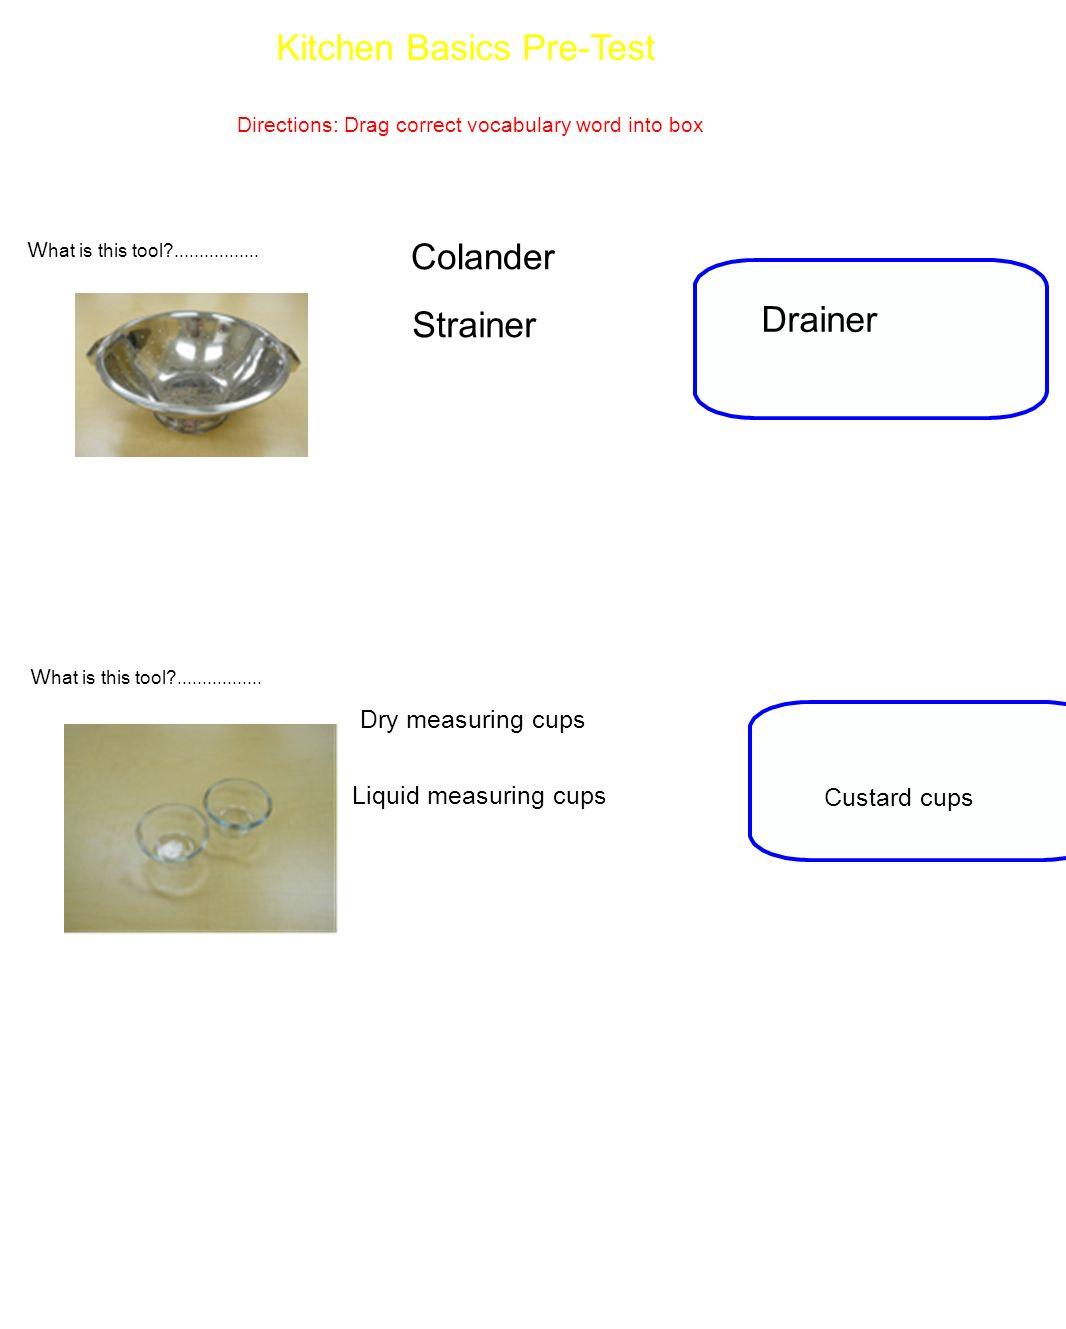 Kitchen Basics Pre-Test - ppt video online download